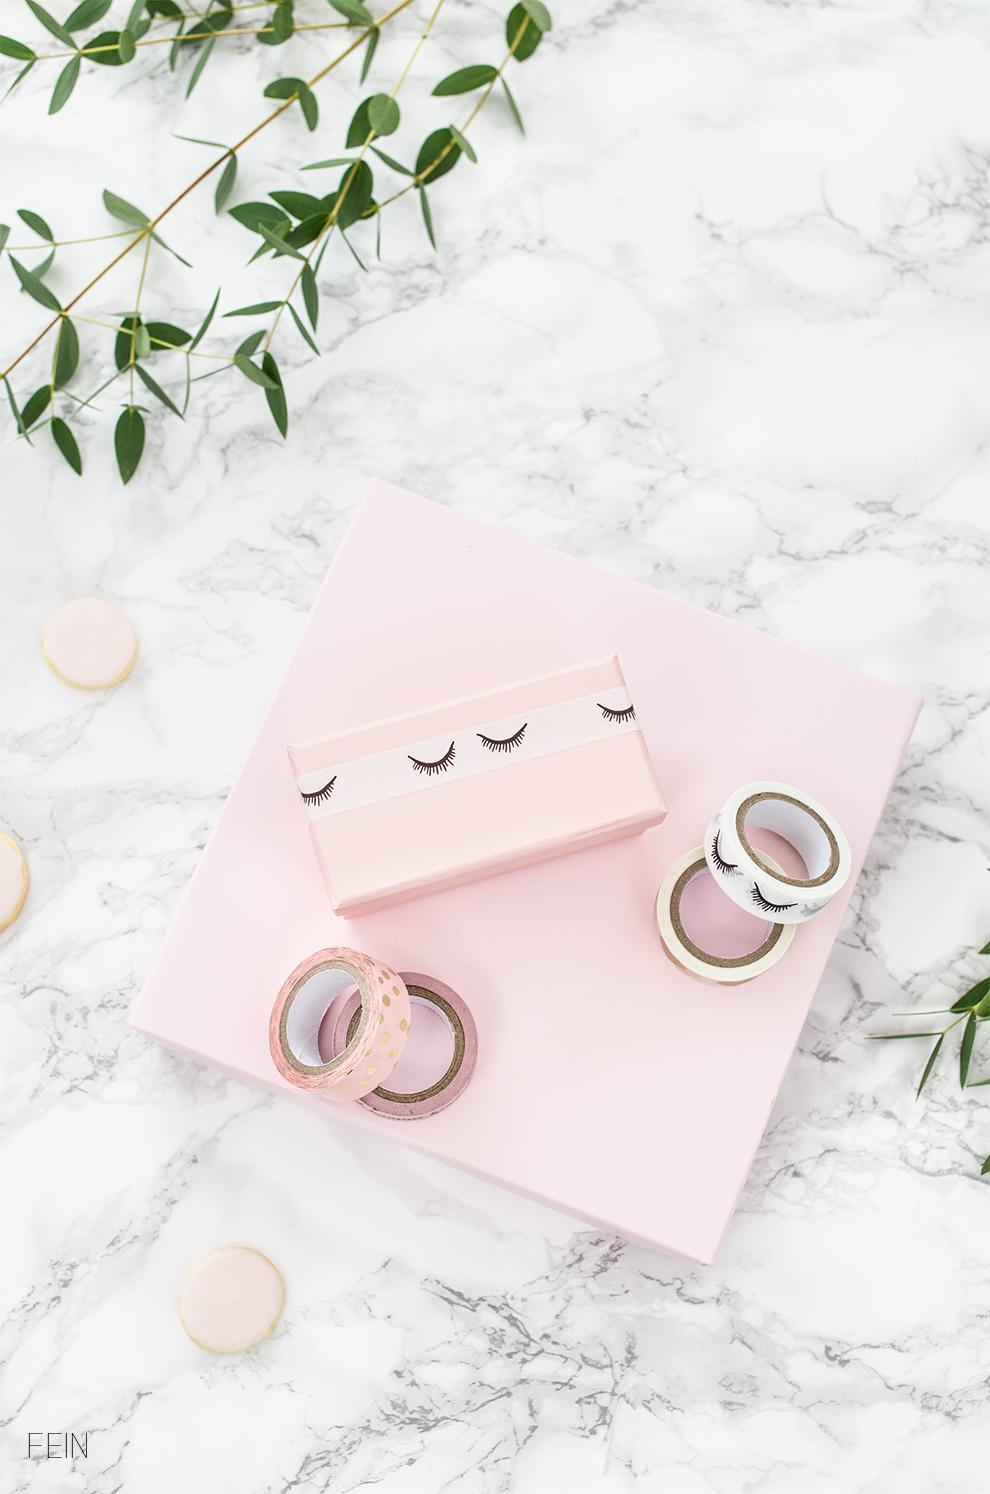 rosa-accessoires-valentinstag